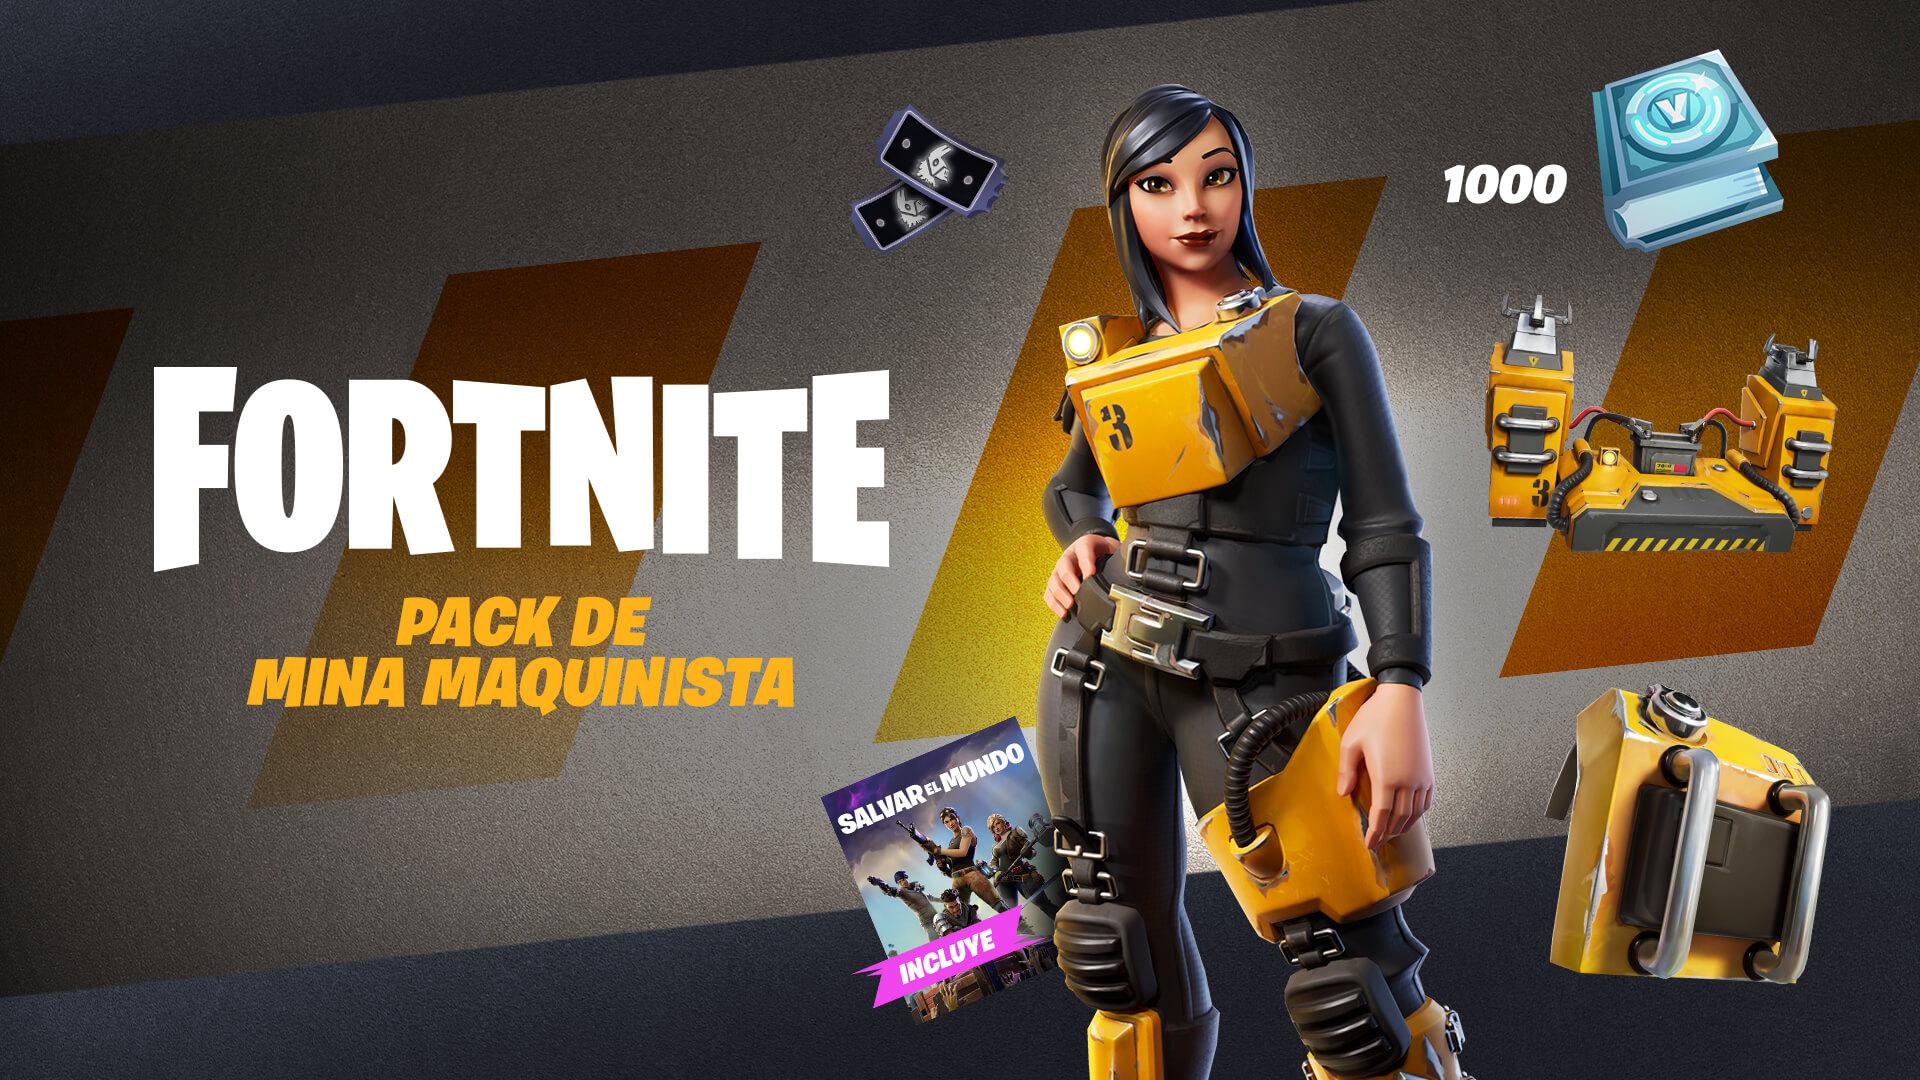 Fortnite Save The World Machinist Mina Pack ESES